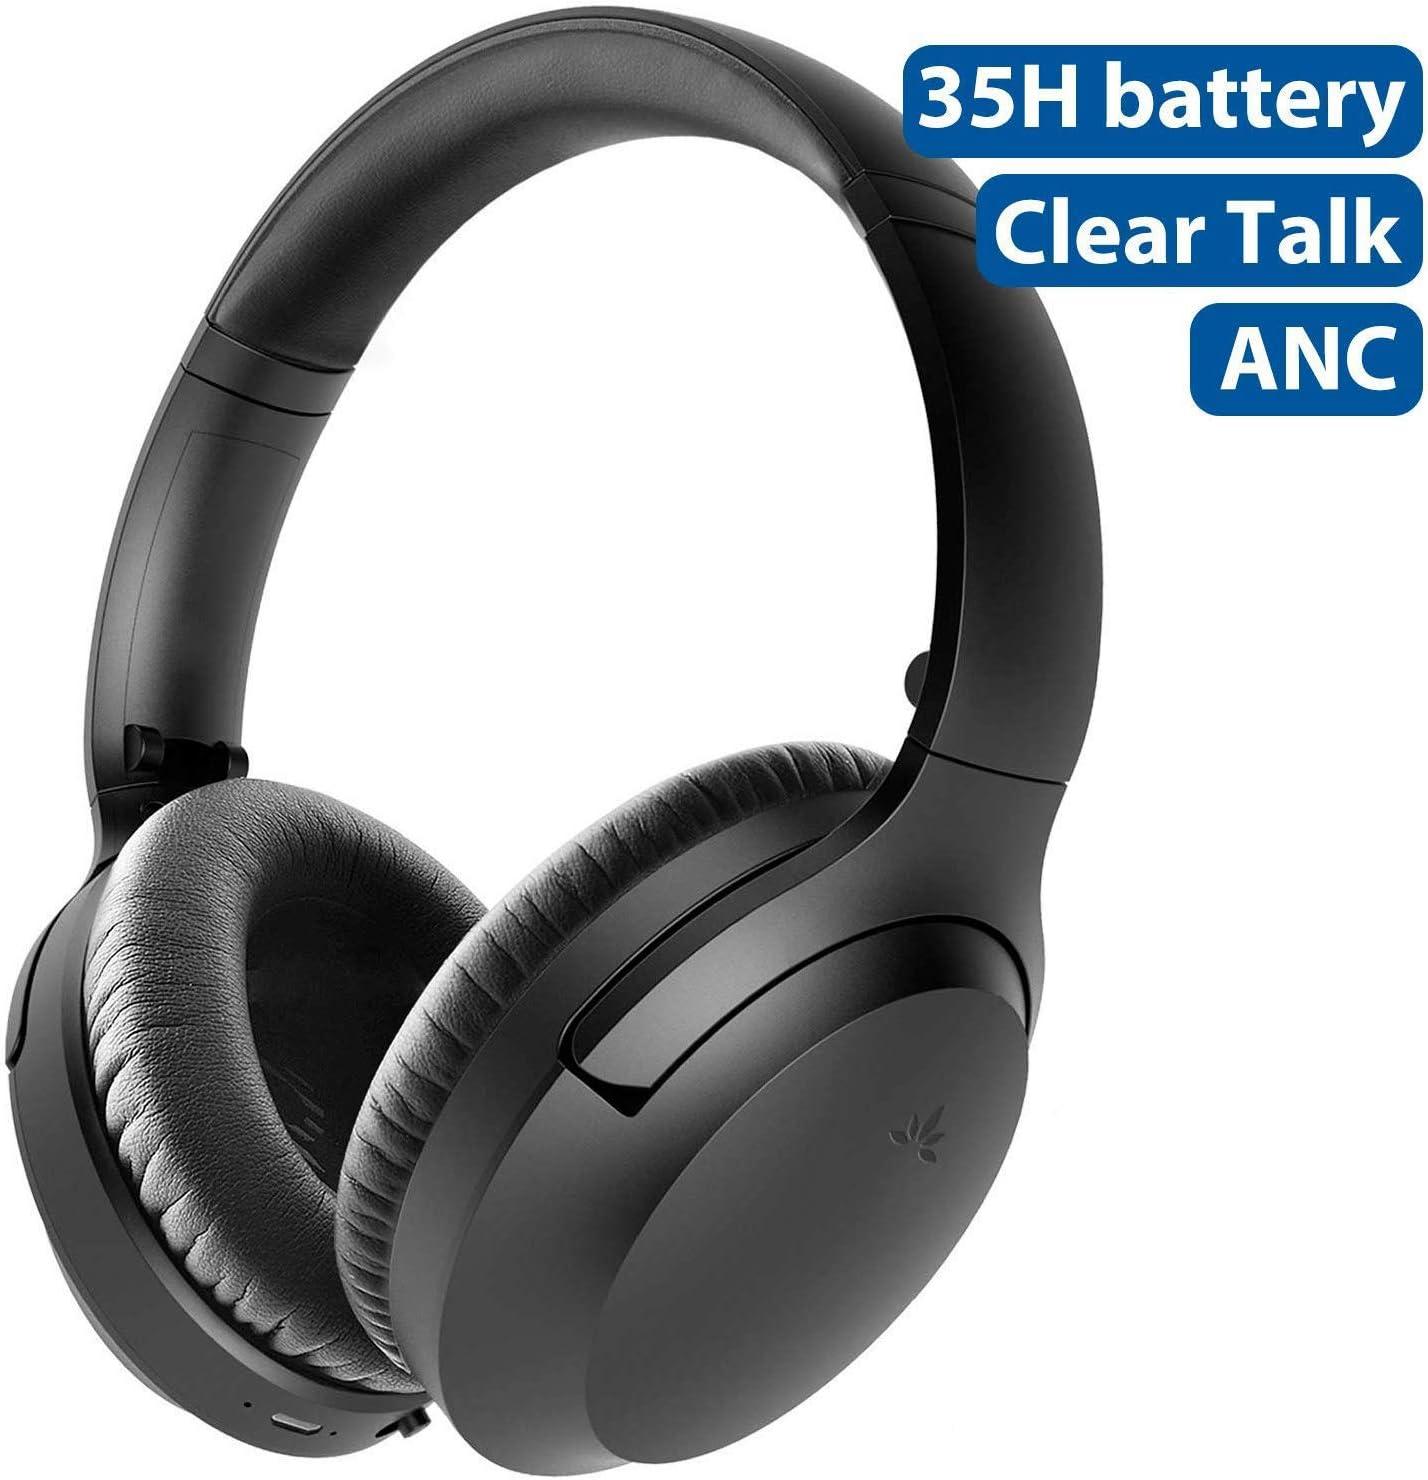 [2020] Avantree Aria Auriculares Bluetooth de Cancelación de Ruido Activo con Micrófono Extra Desmontable para llamadas, Buen Sonido, Almohadillas Anchas Reemplazables, 35H, Cableado e Inalámbrico ANC